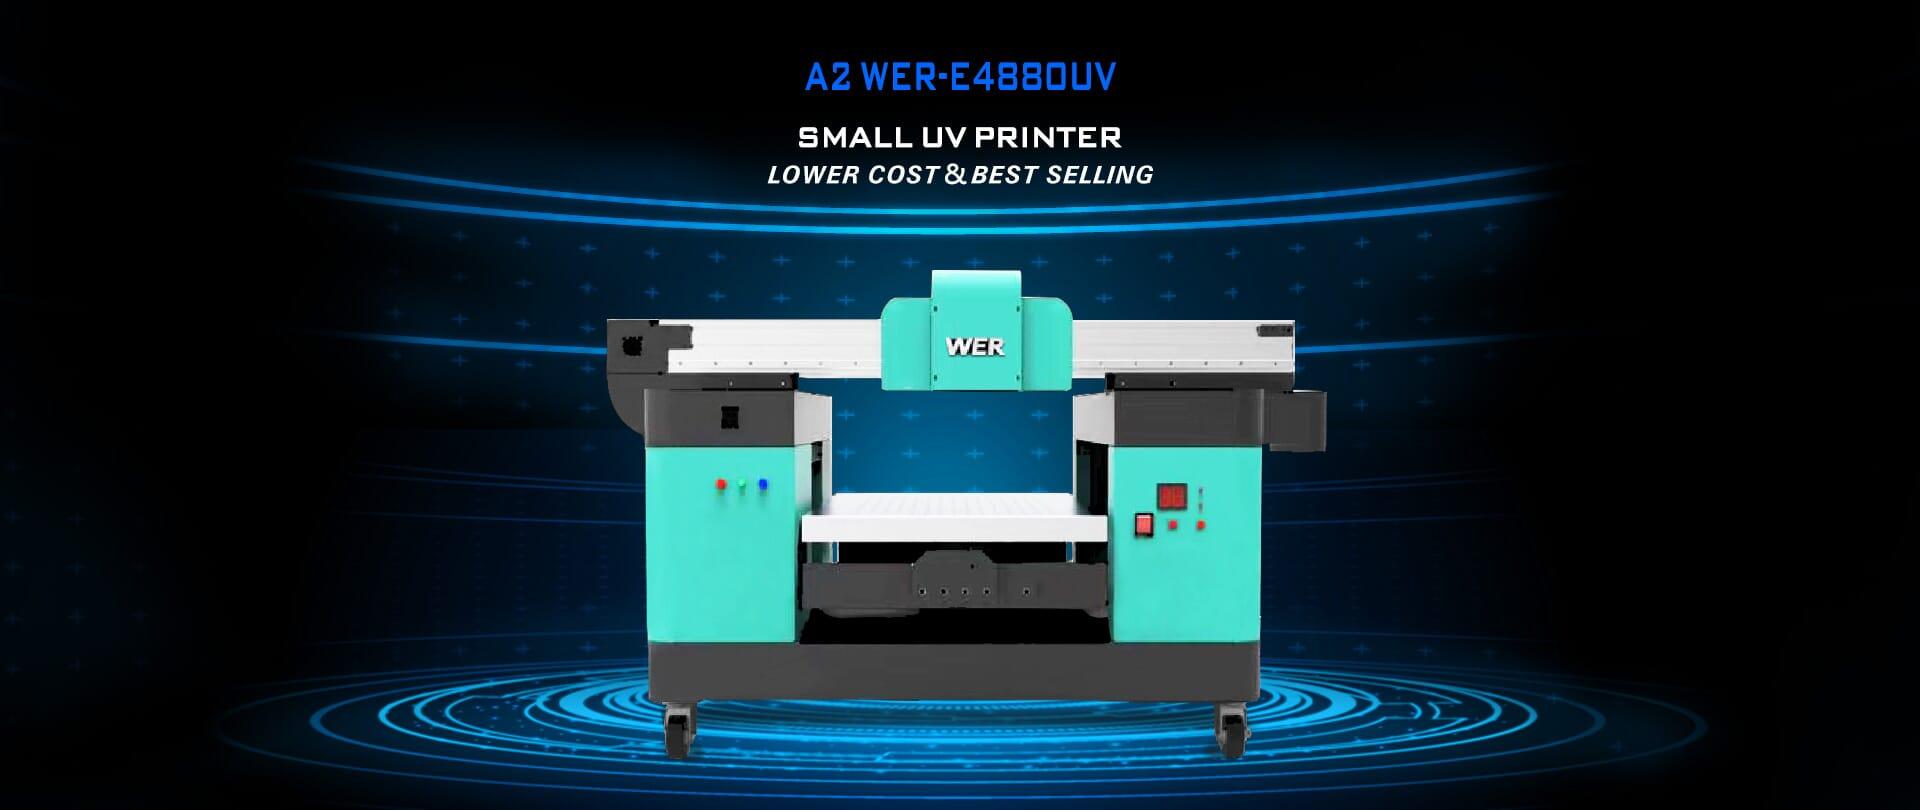 WER A2 WER-E4880UV Small UV Printer